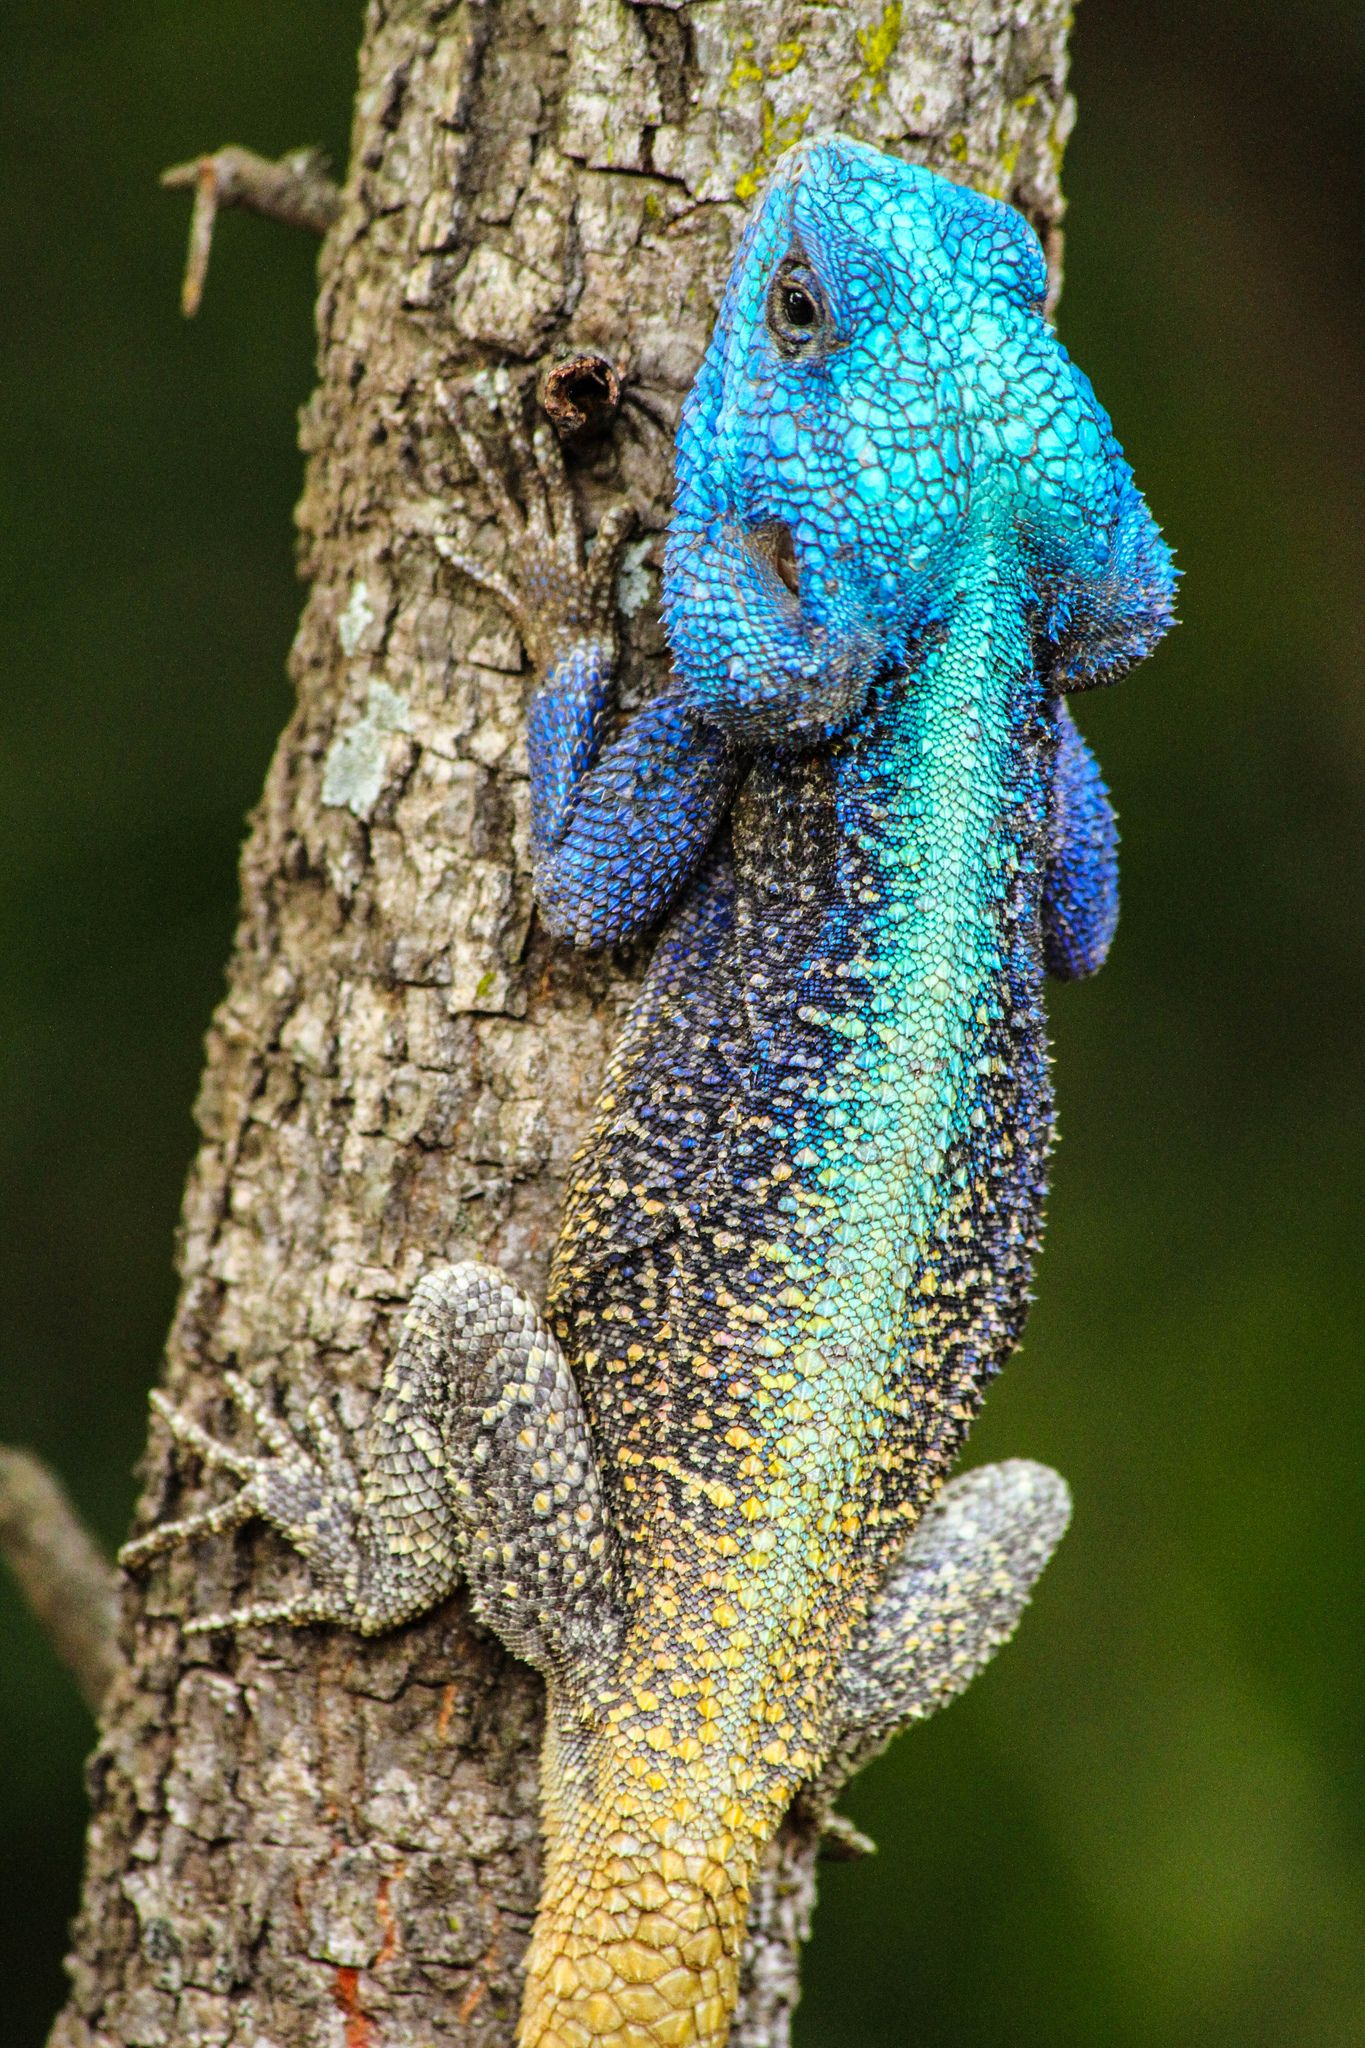 Colourful Blue Headed Agama Lizard In South Africa